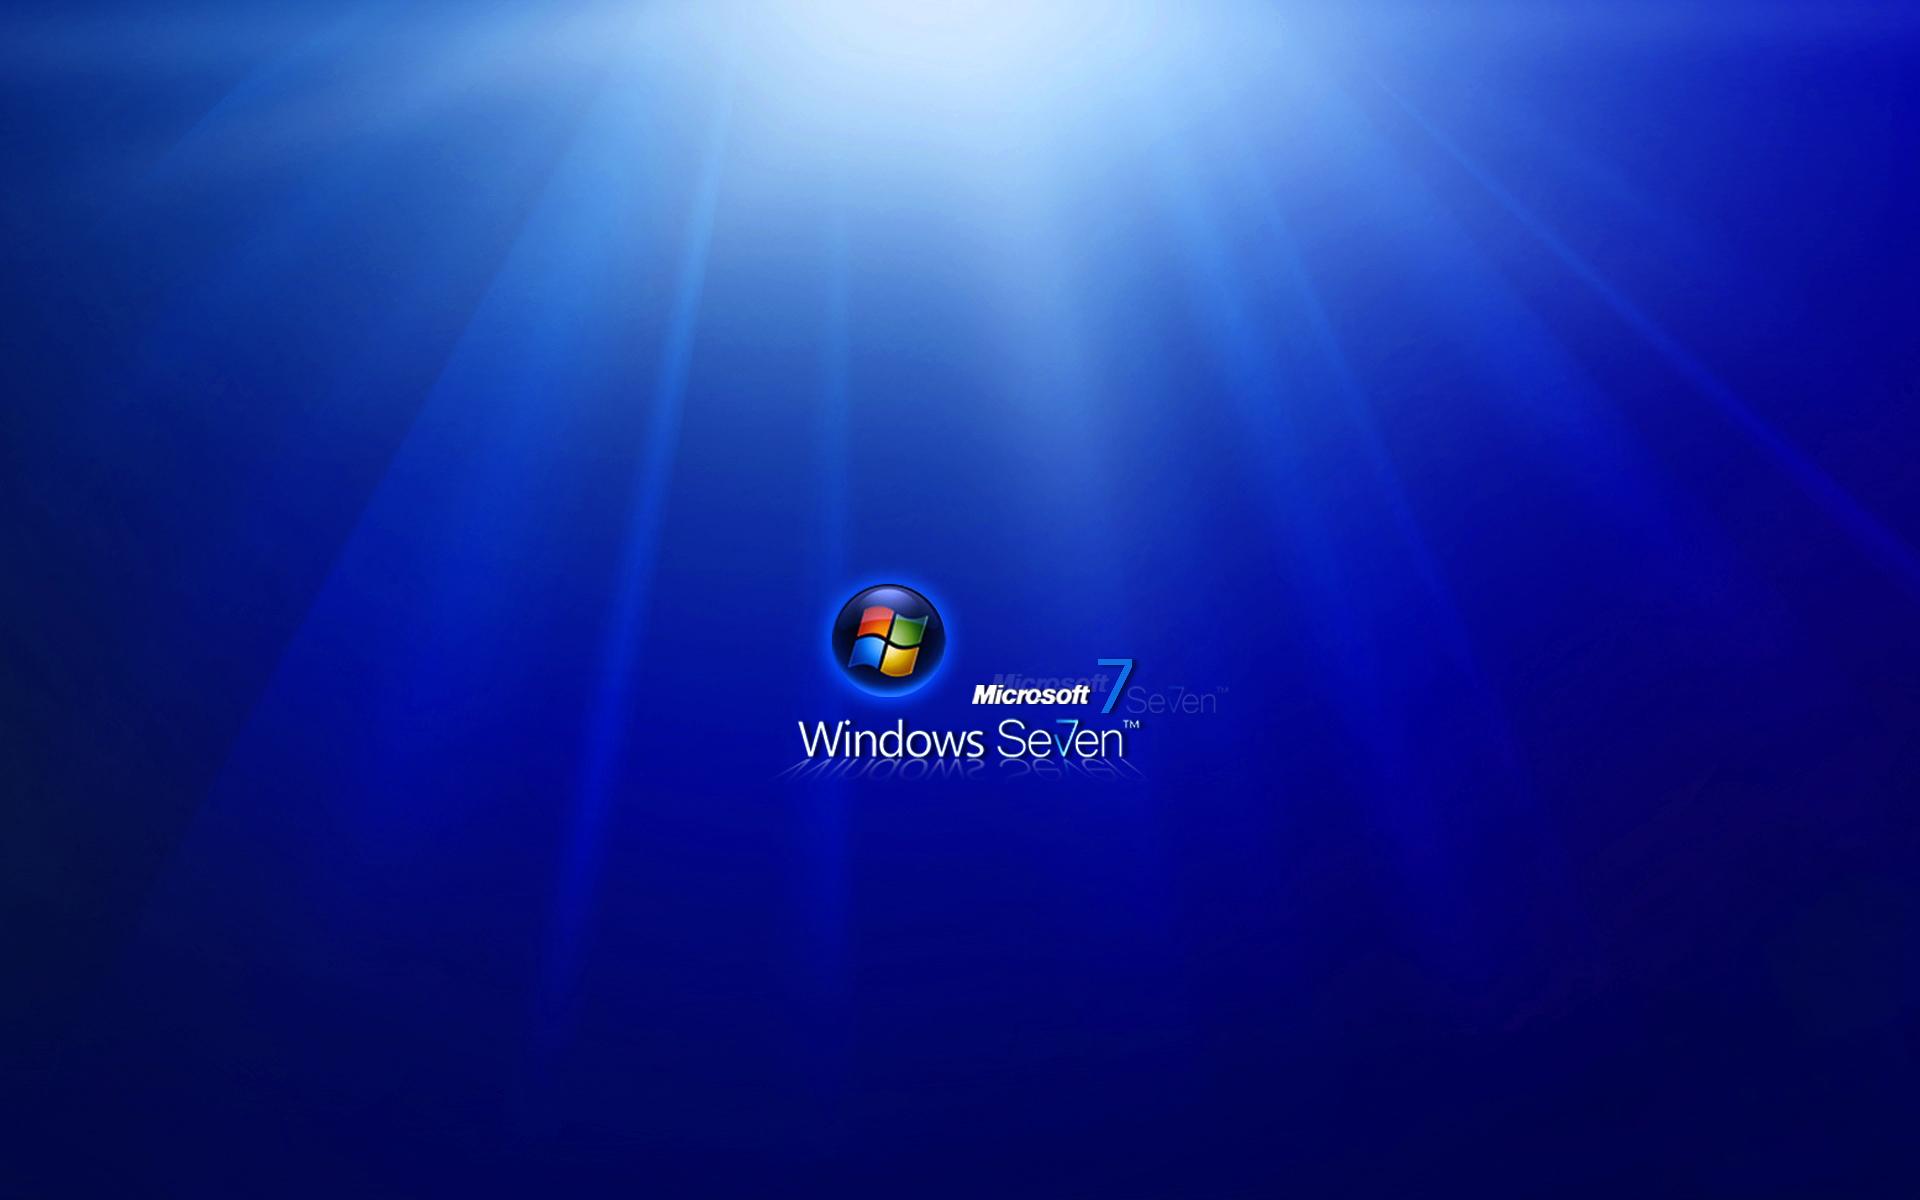 Windows 7 Beta wallpaper 9332 1920x1200